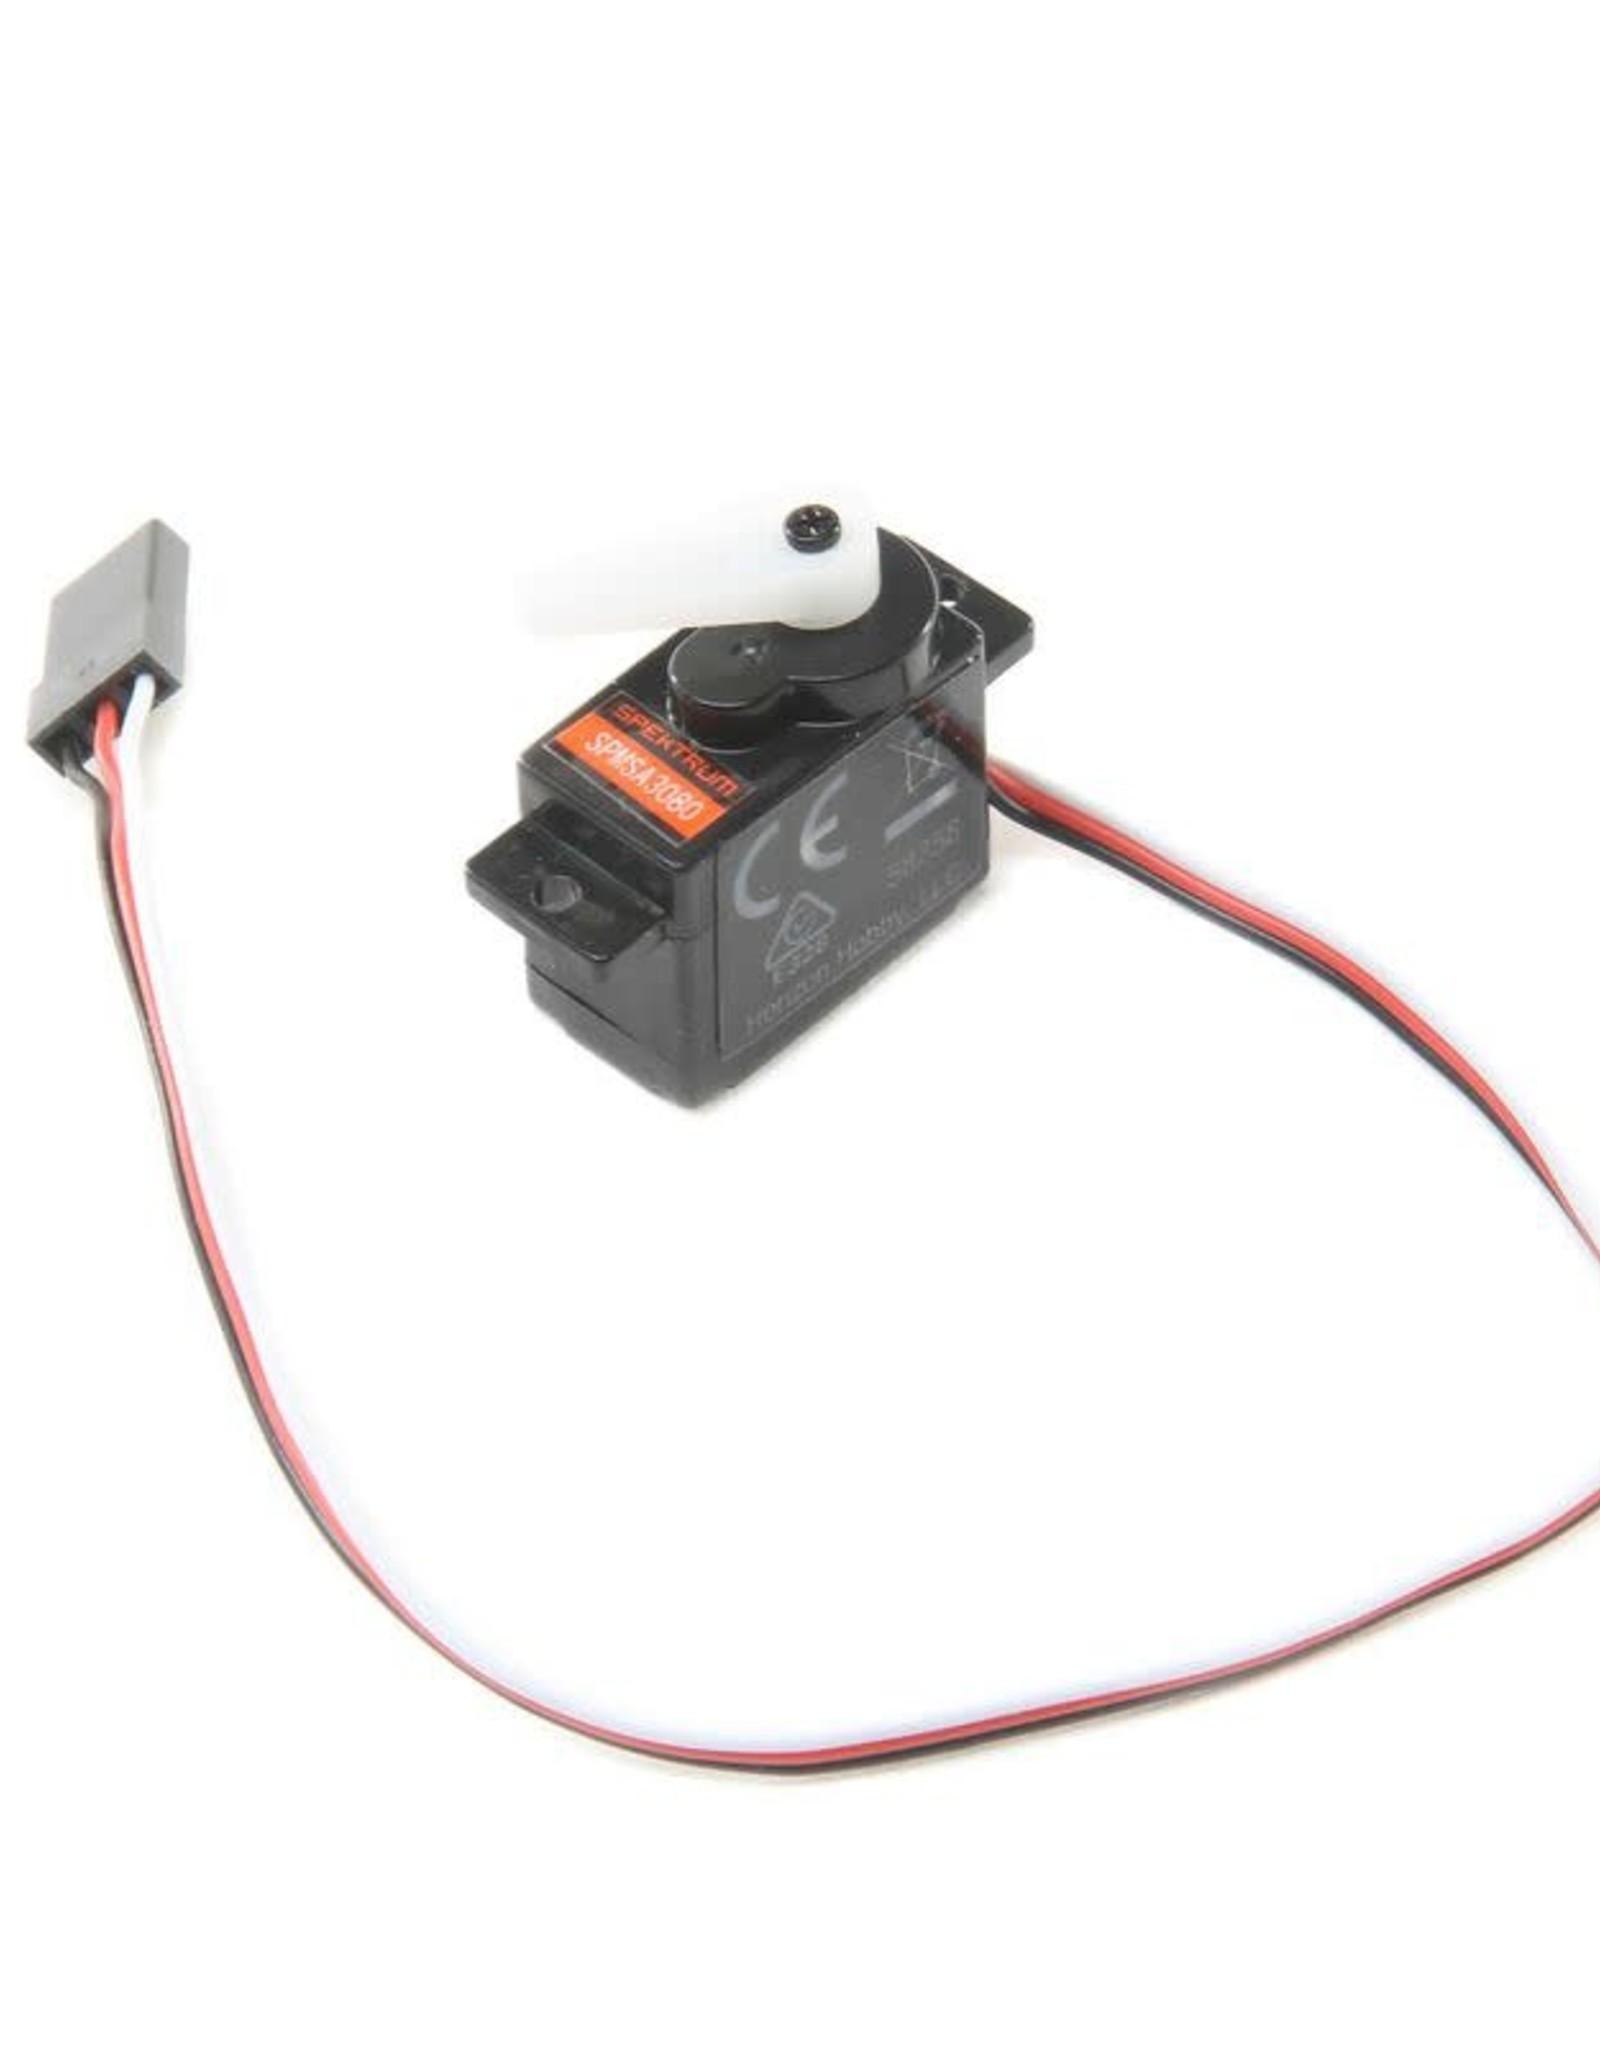 spektrum SPMSA3080 5g Sub-Micro Analog Air Servo